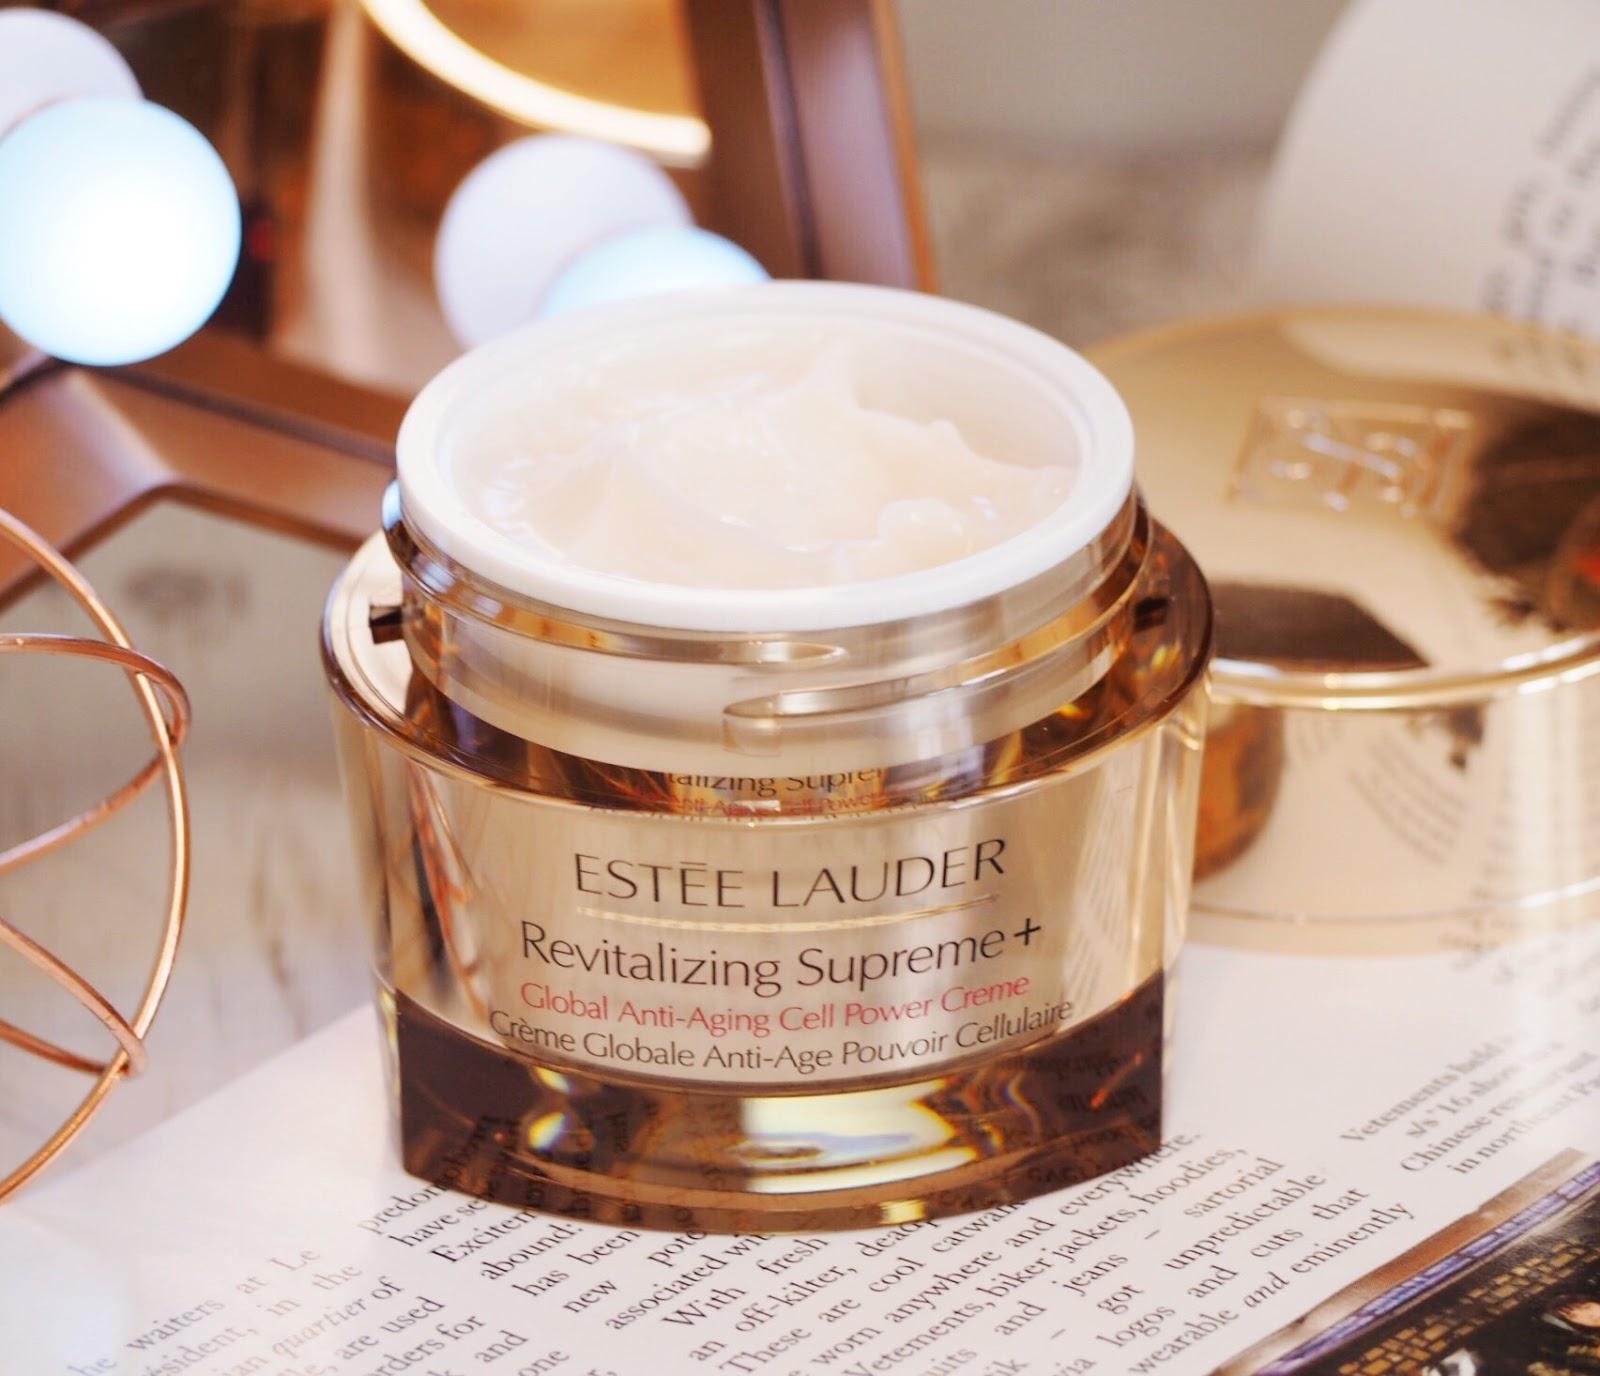 estee_lauder_revitalizing_supreme_plus_global_anti_aging_power_cream_50ml_ljbeauty_jpg1